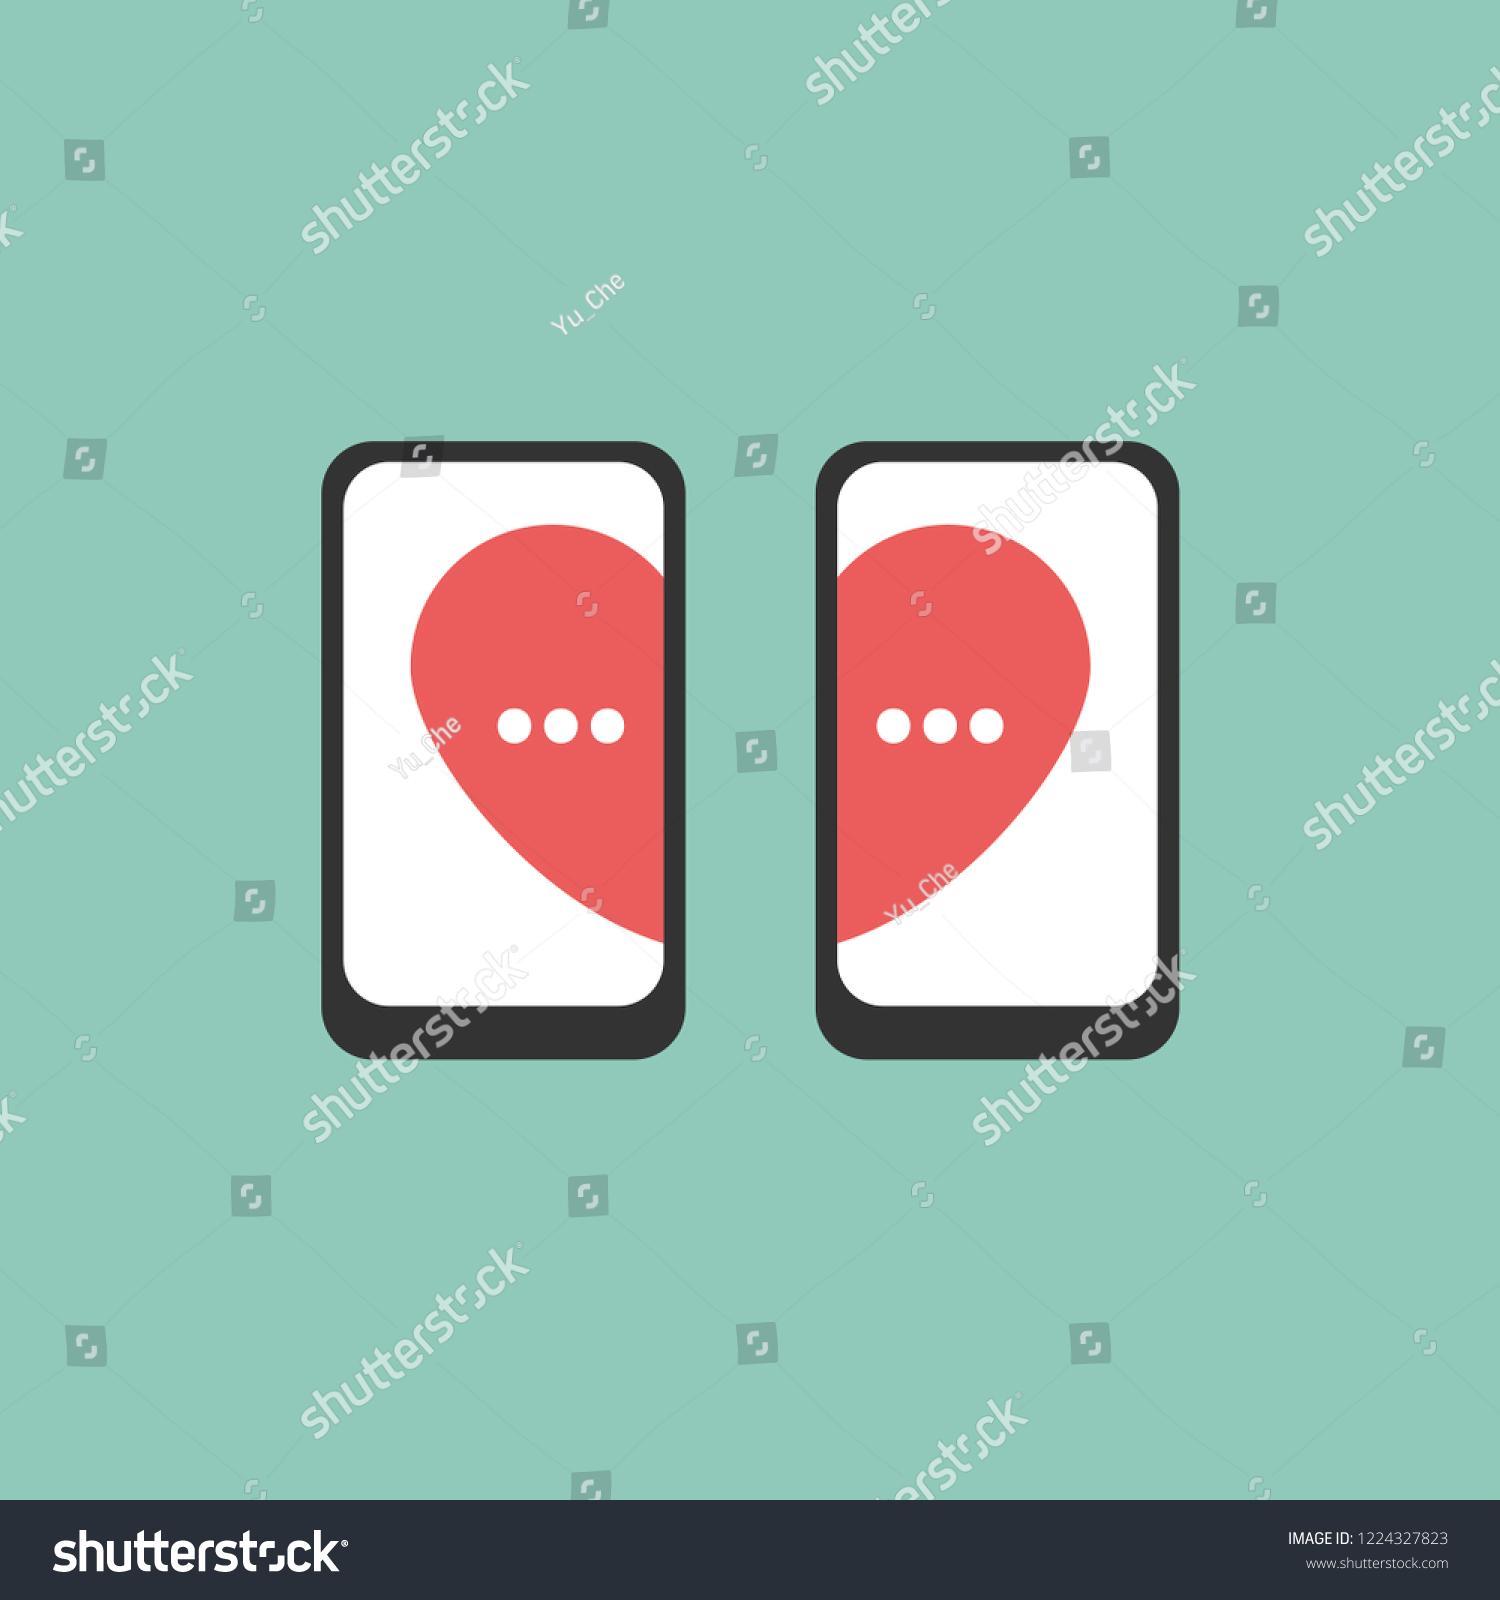 online dating ne Όταν τα ραντεβού πρέπει να μιλάς καθημερινά